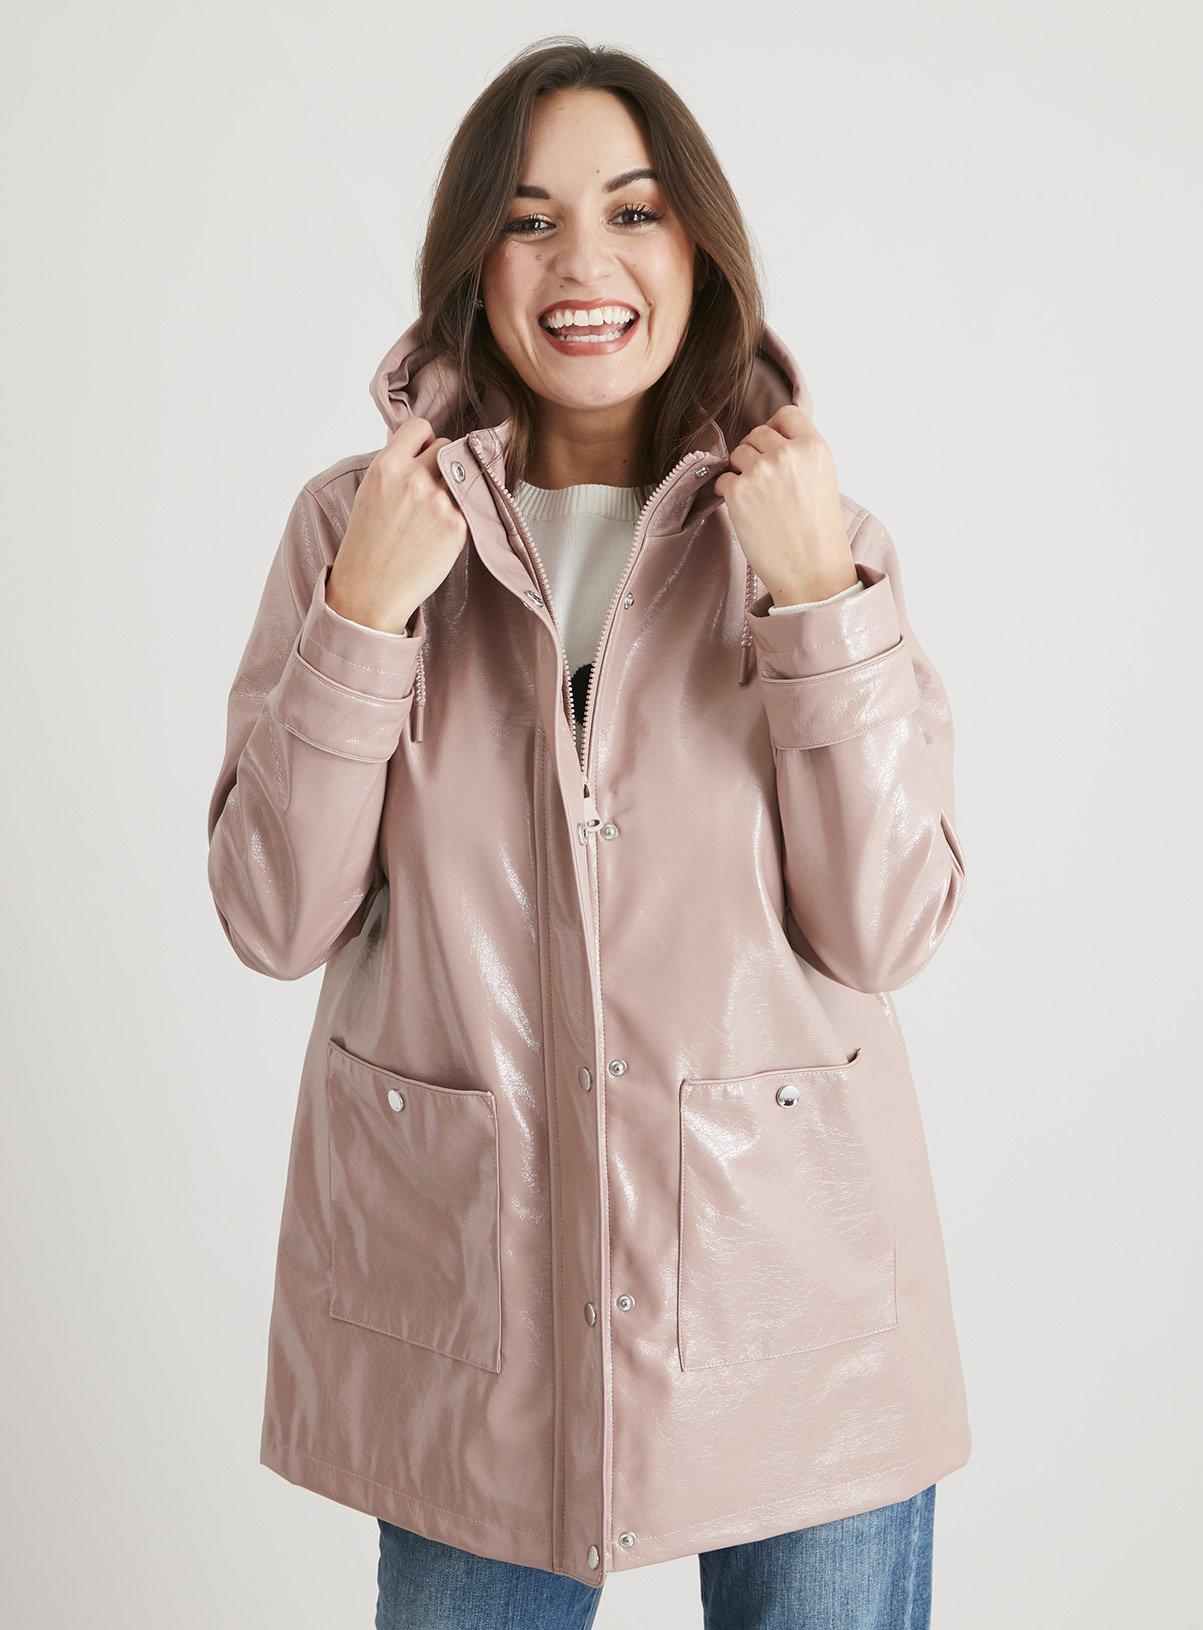 Pink Shower Resistant Vinyl Rubber Raincoat - 20